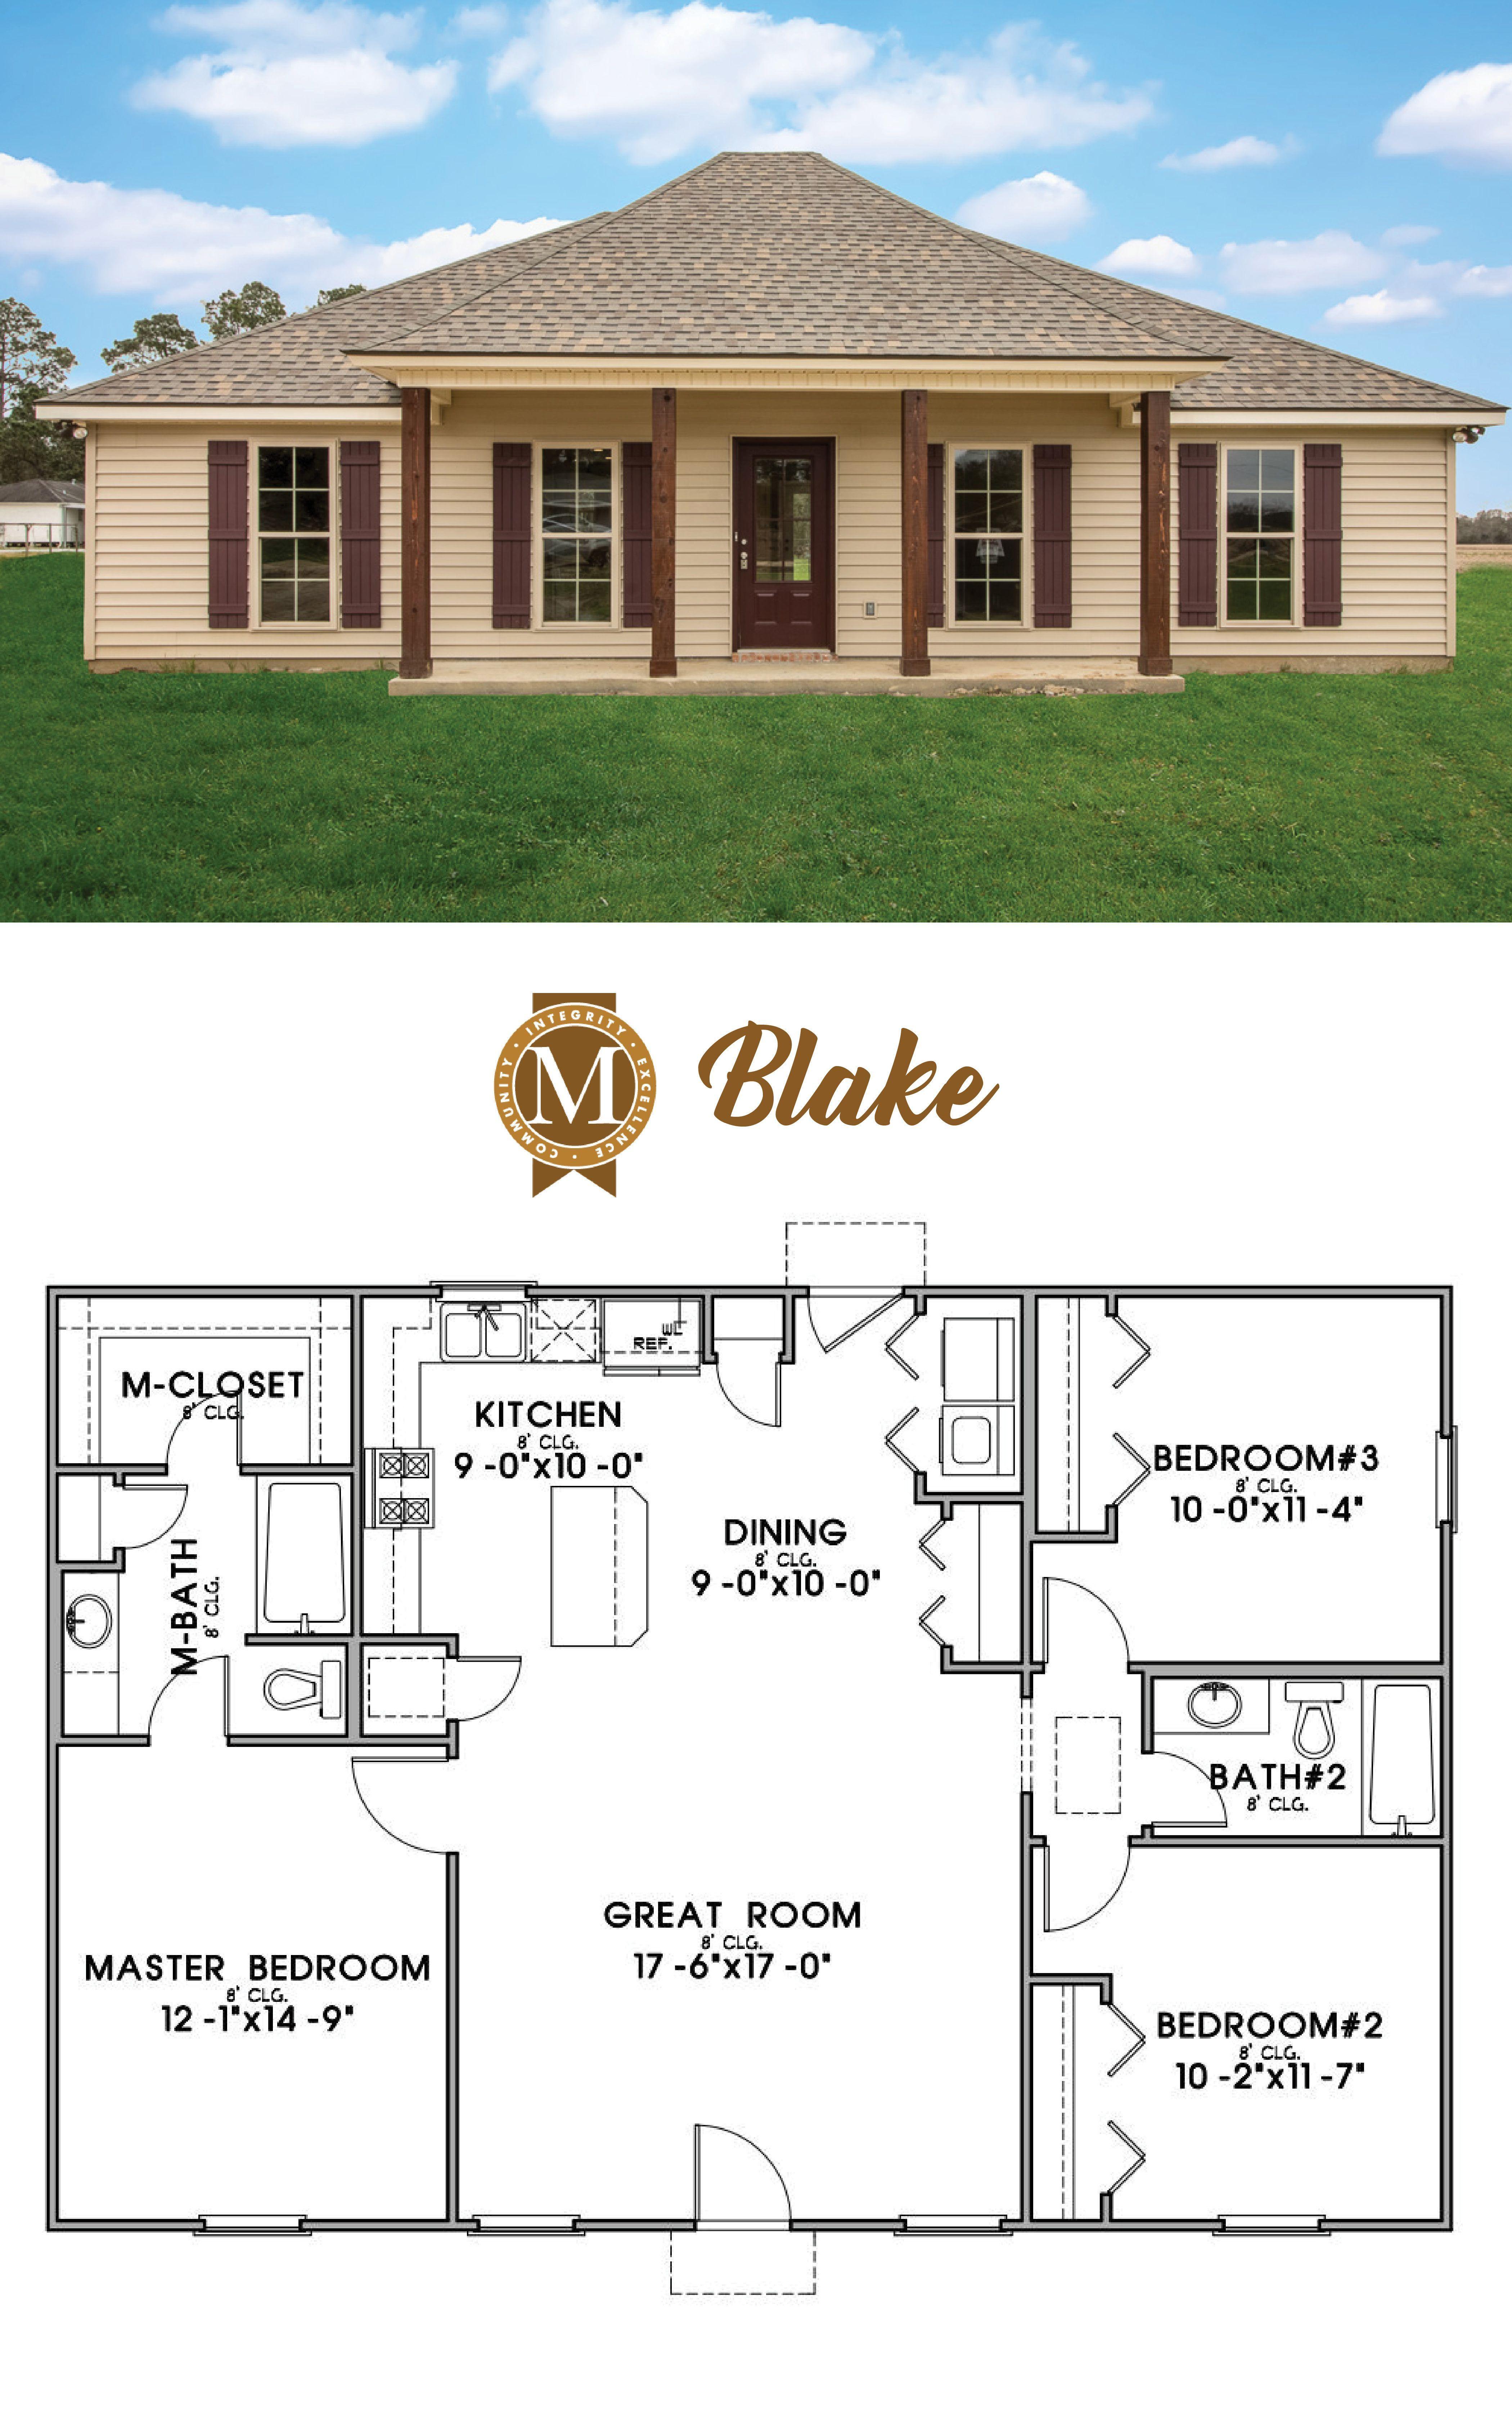 39+ Blue-ribbon Simple Home Plans Cottages That Will Inspire | Simple house  plans, Dream house plans, Simple house